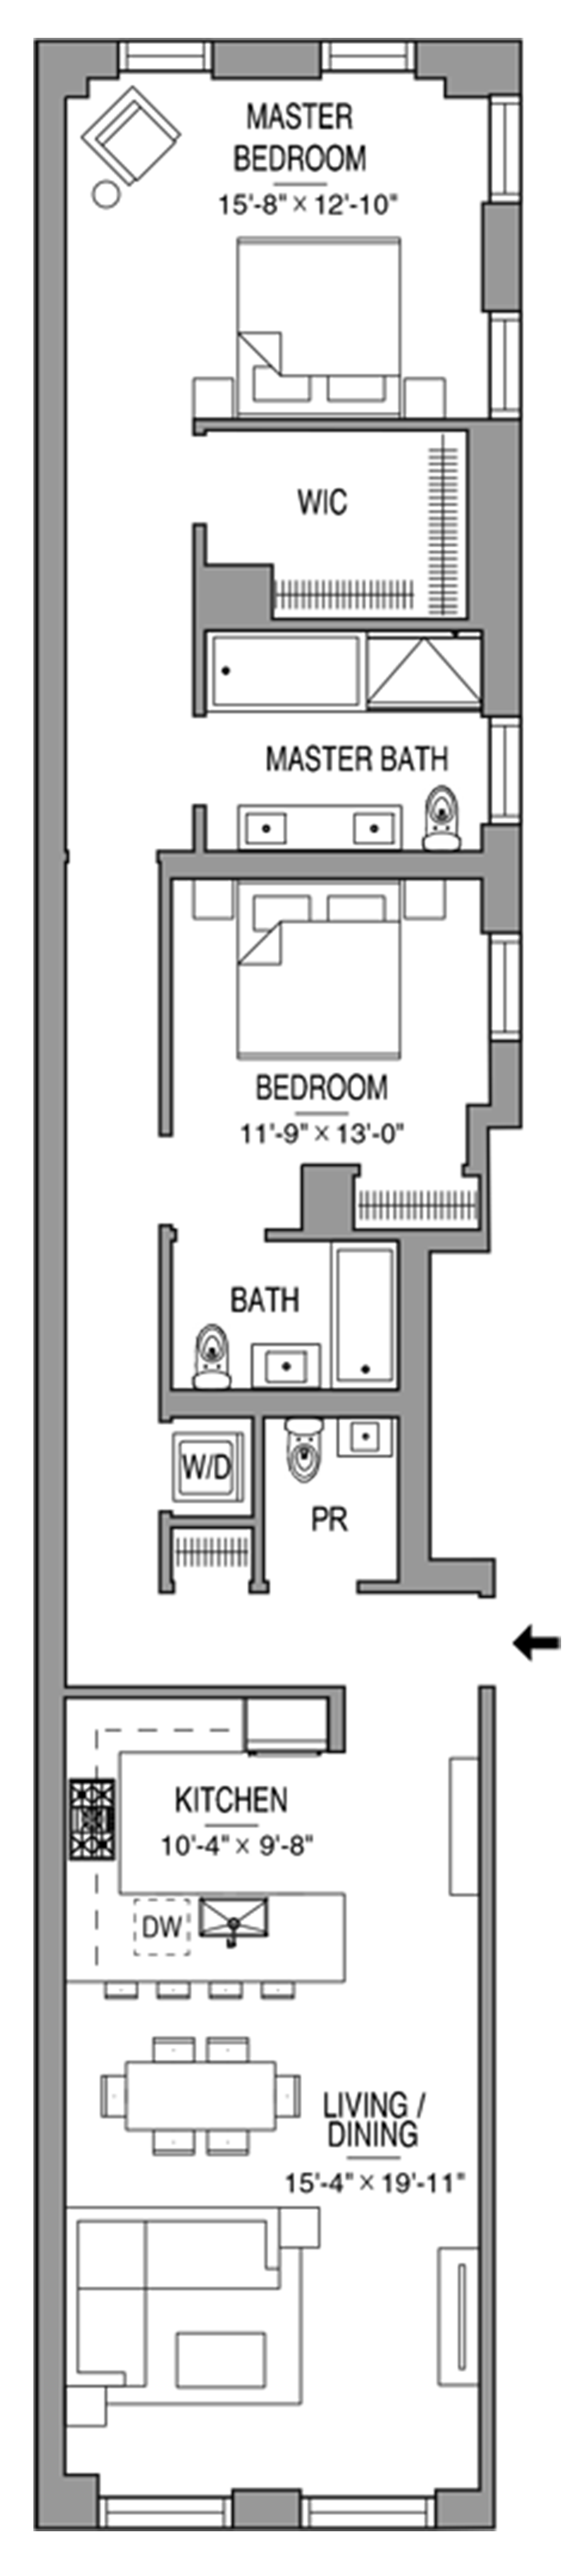 Residence 601